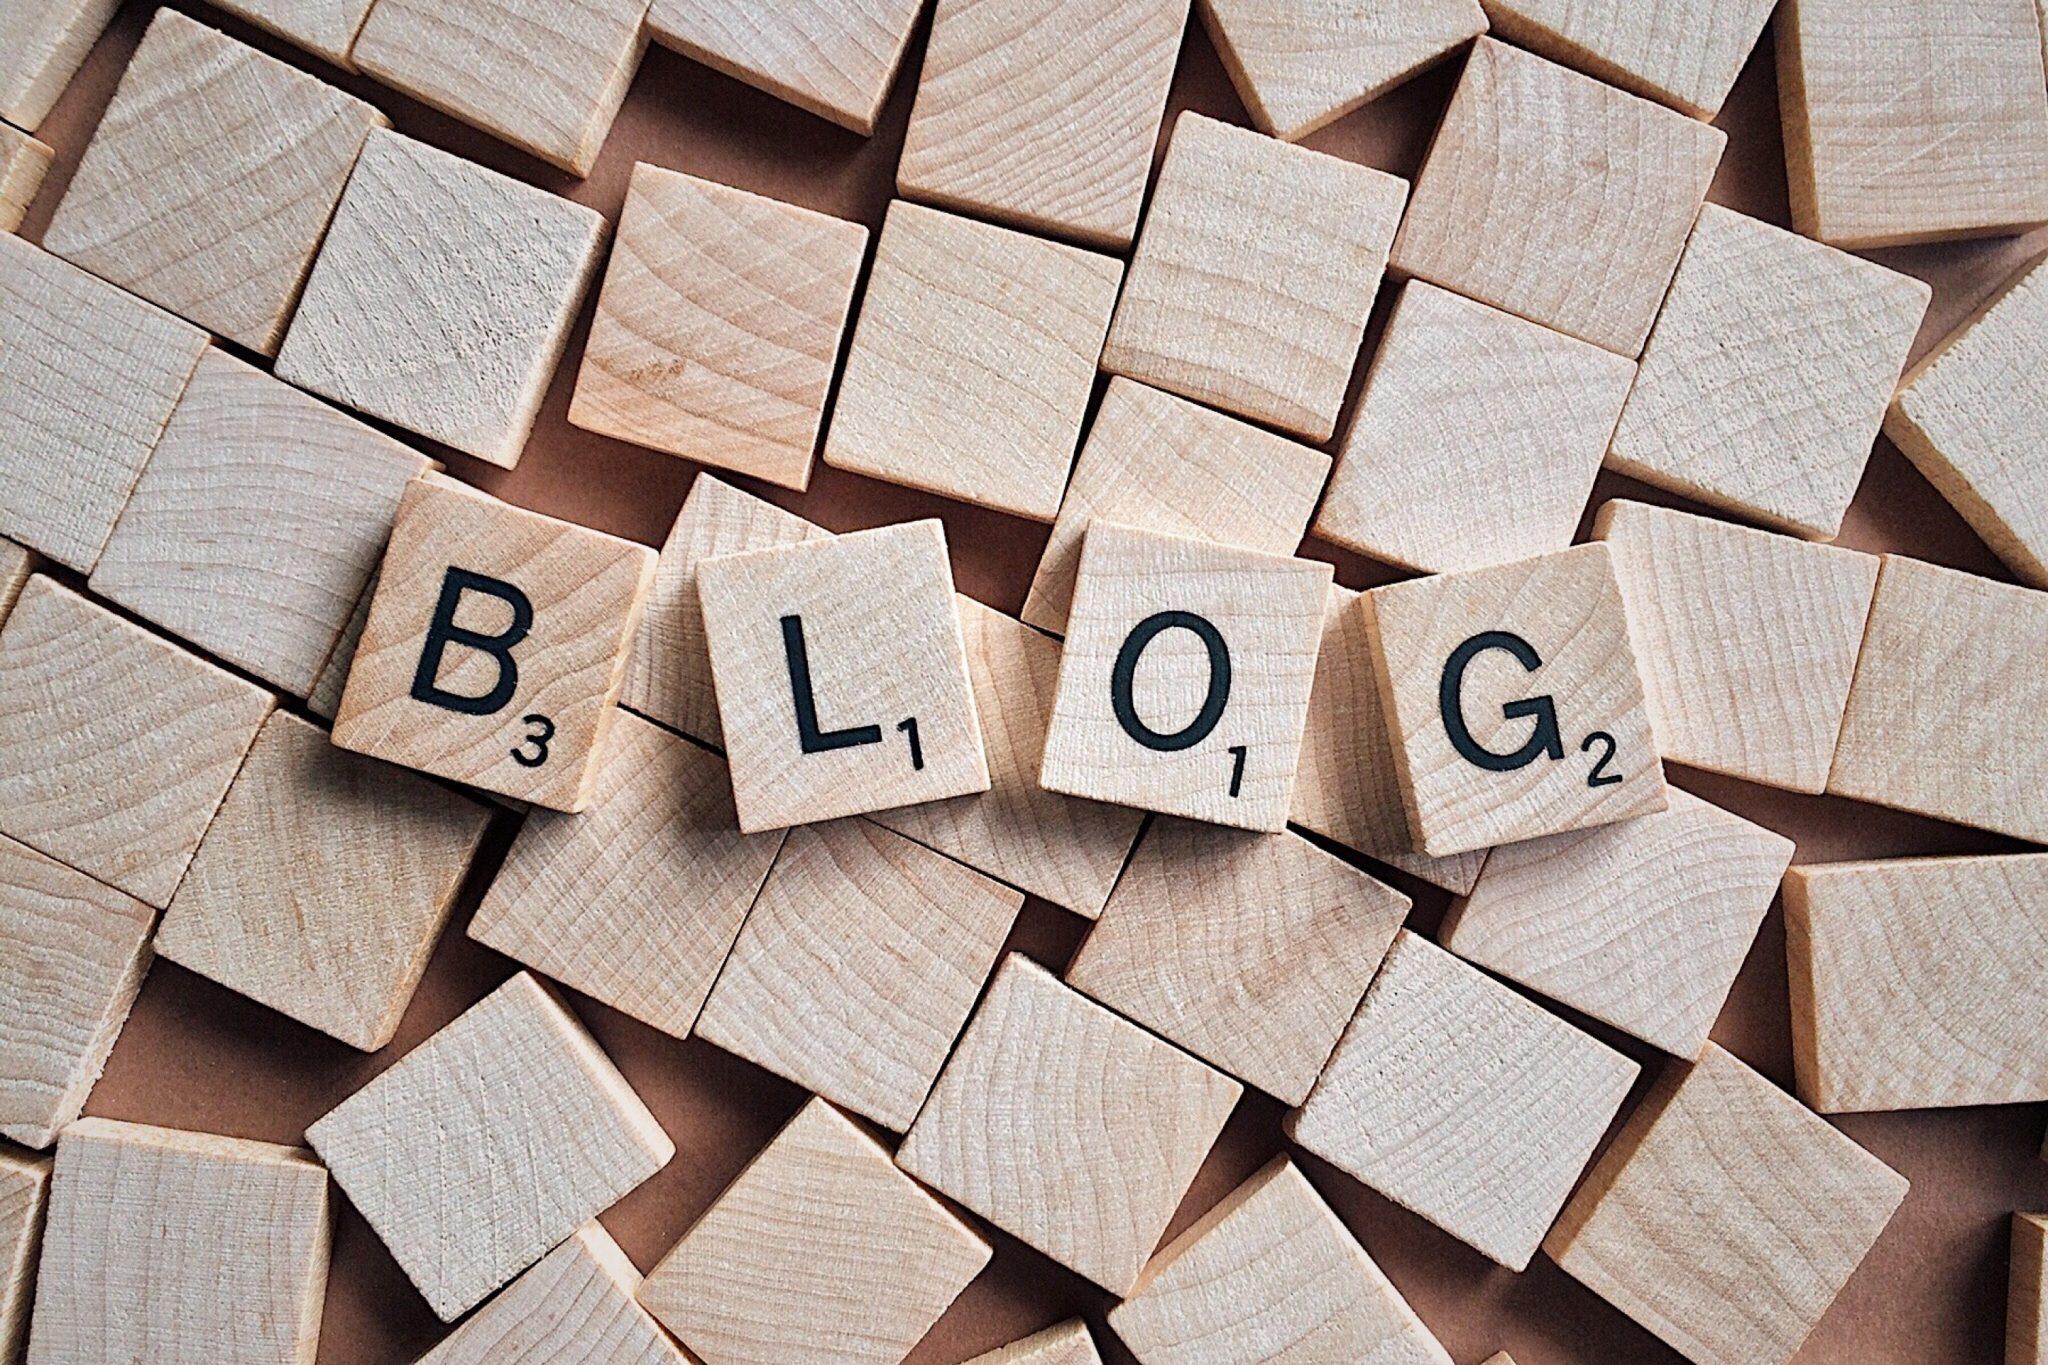 Blog Away